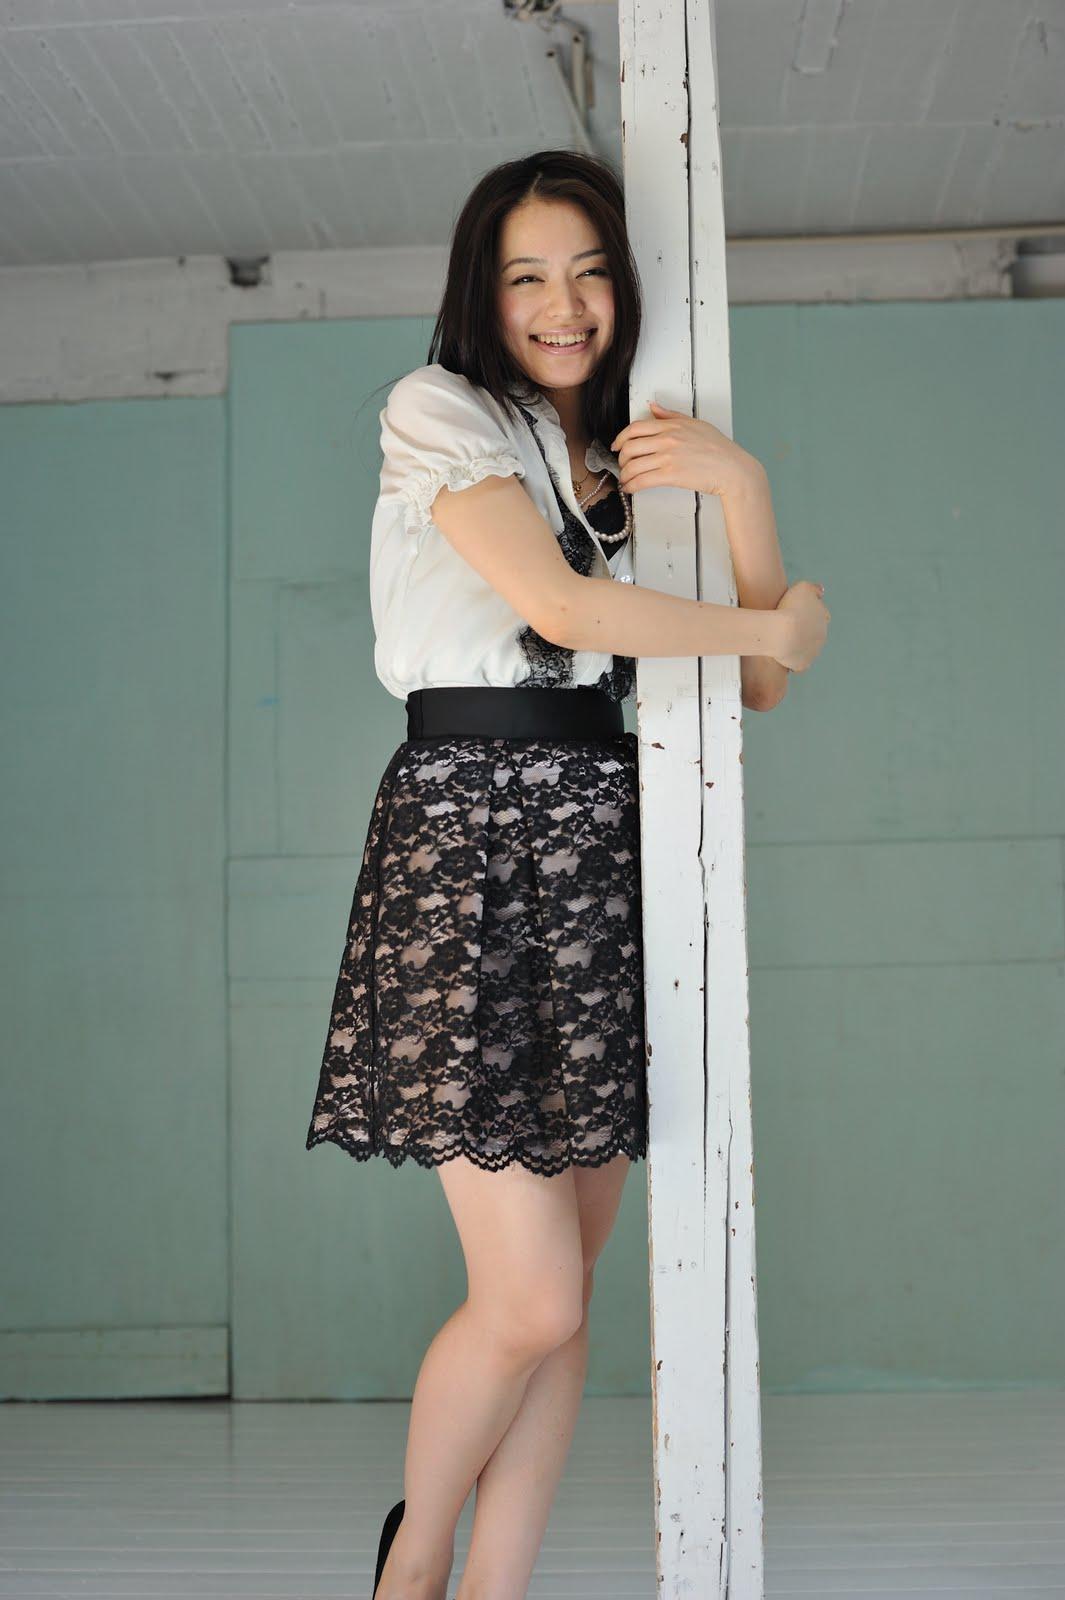 Manami Yamaguchi Nice Dress Then Bikini  Asian Girls Sexy-5361